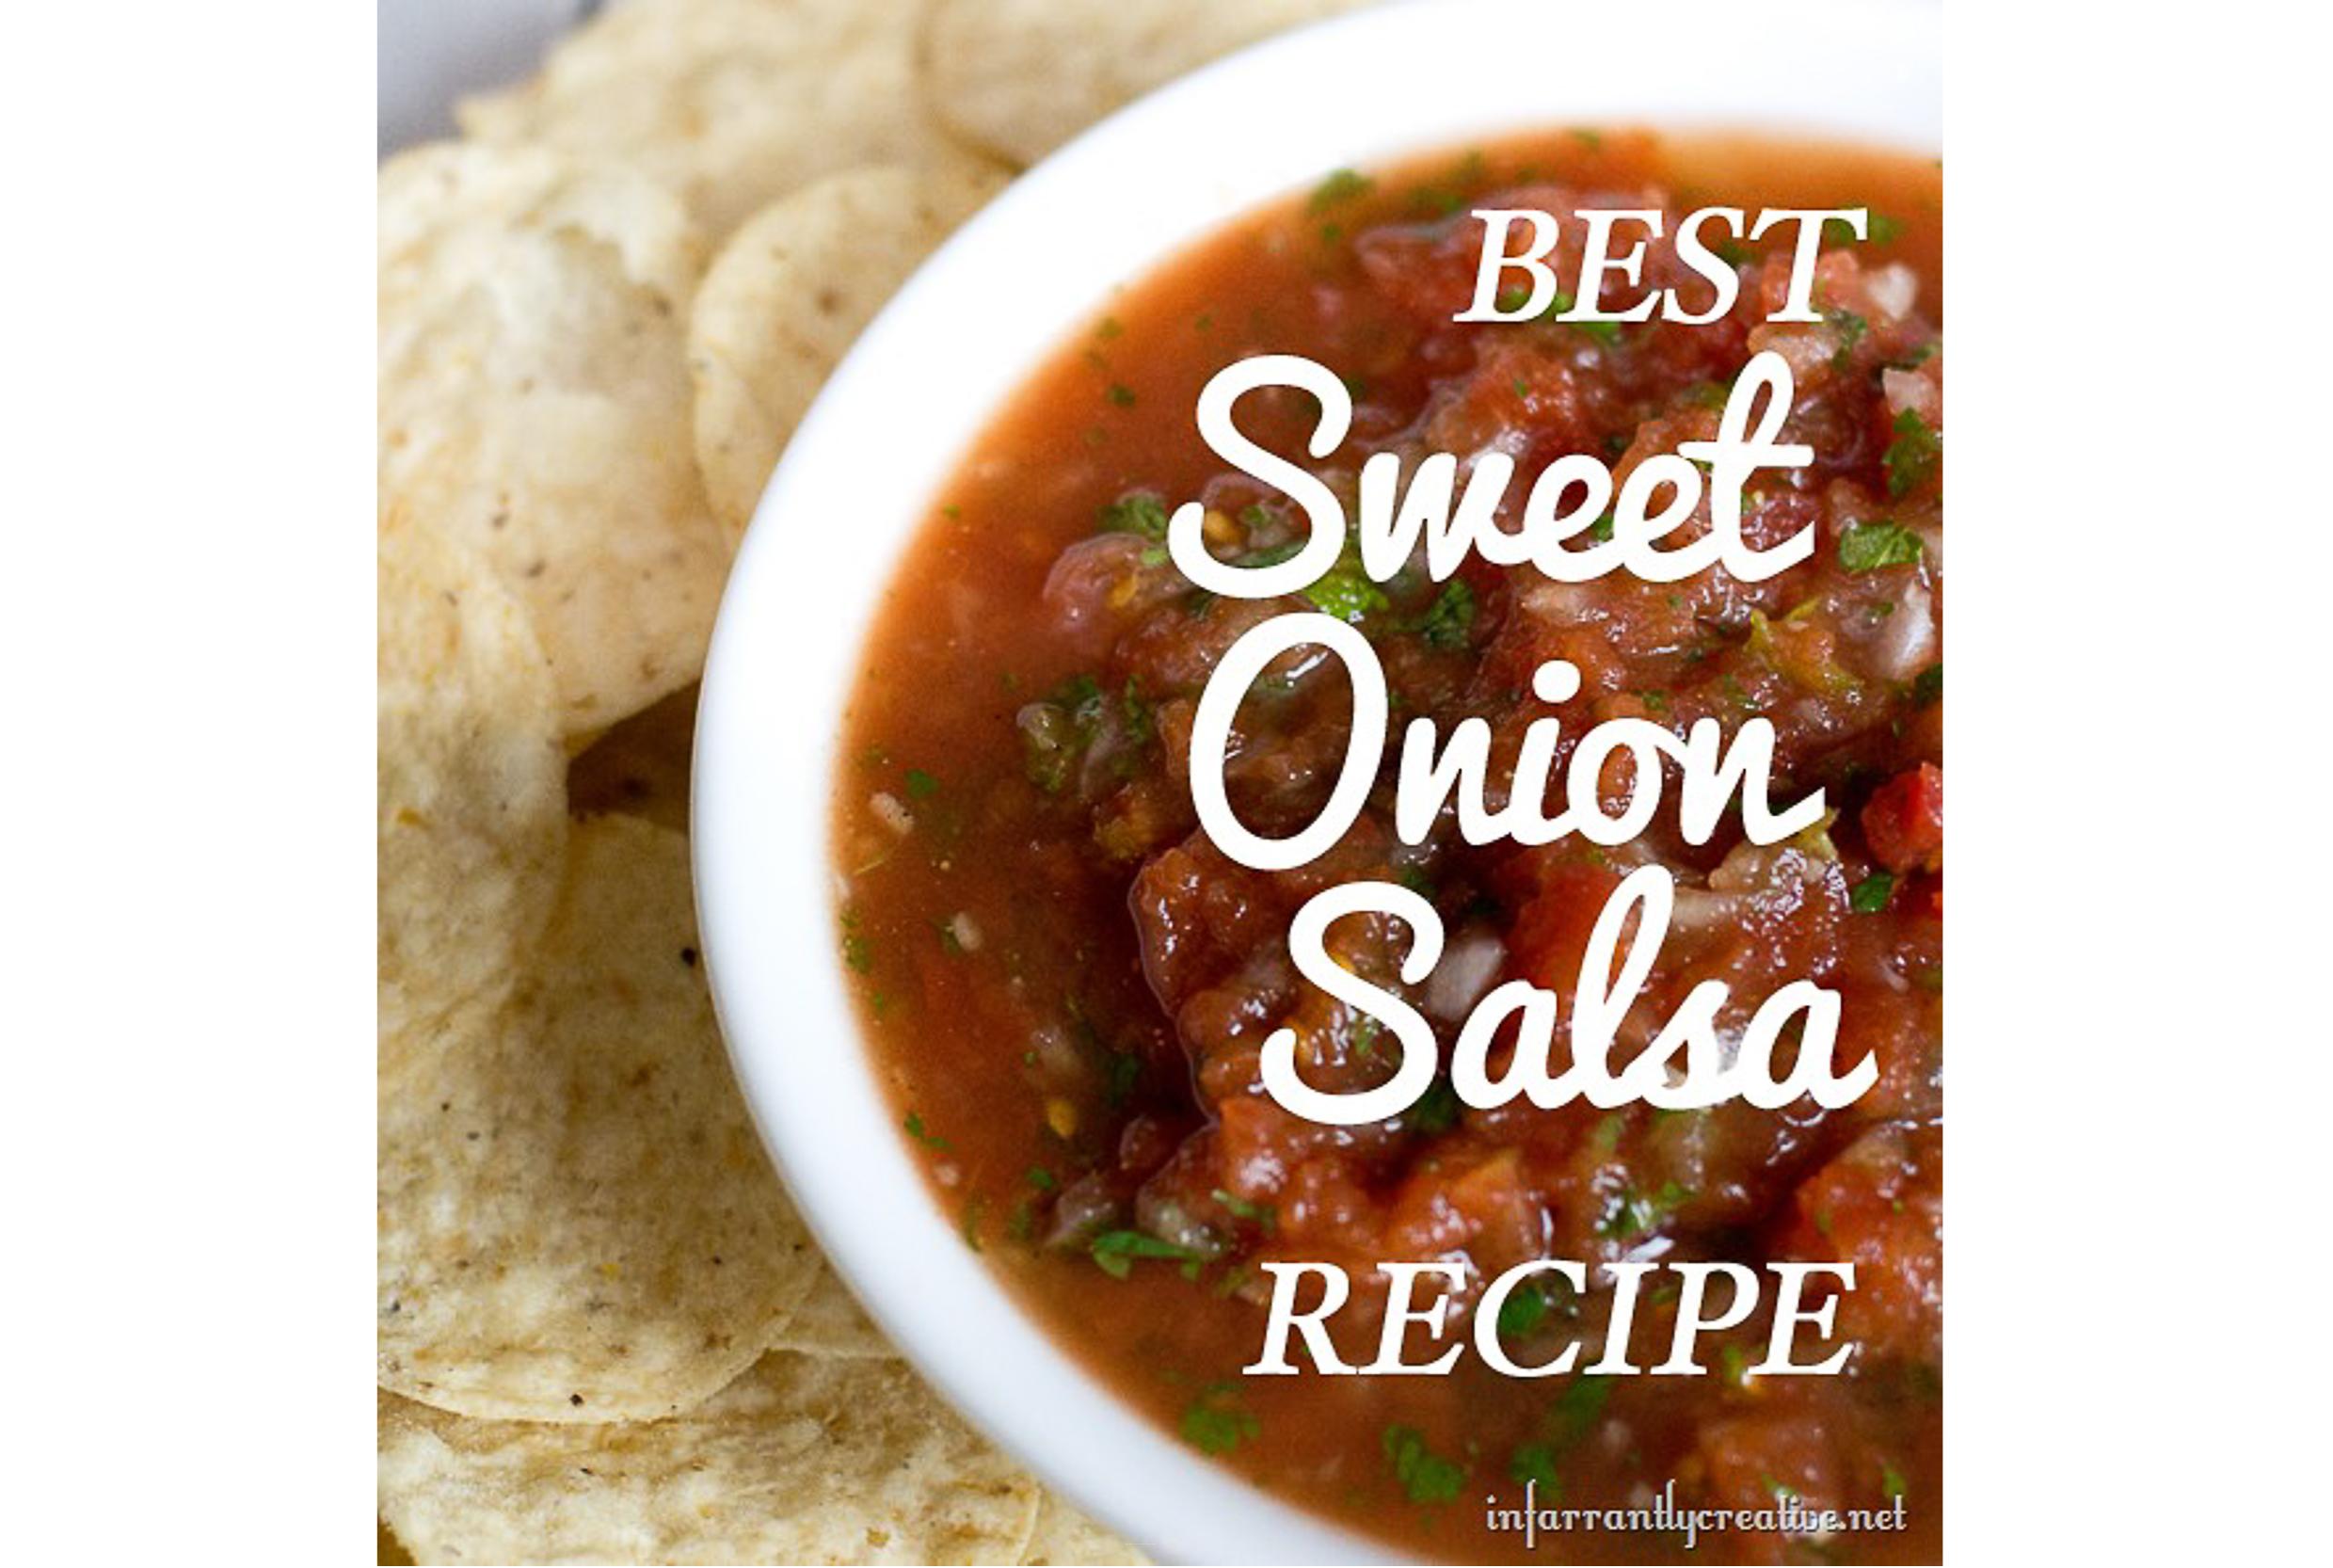 Homemade Sweet Onion Salsa